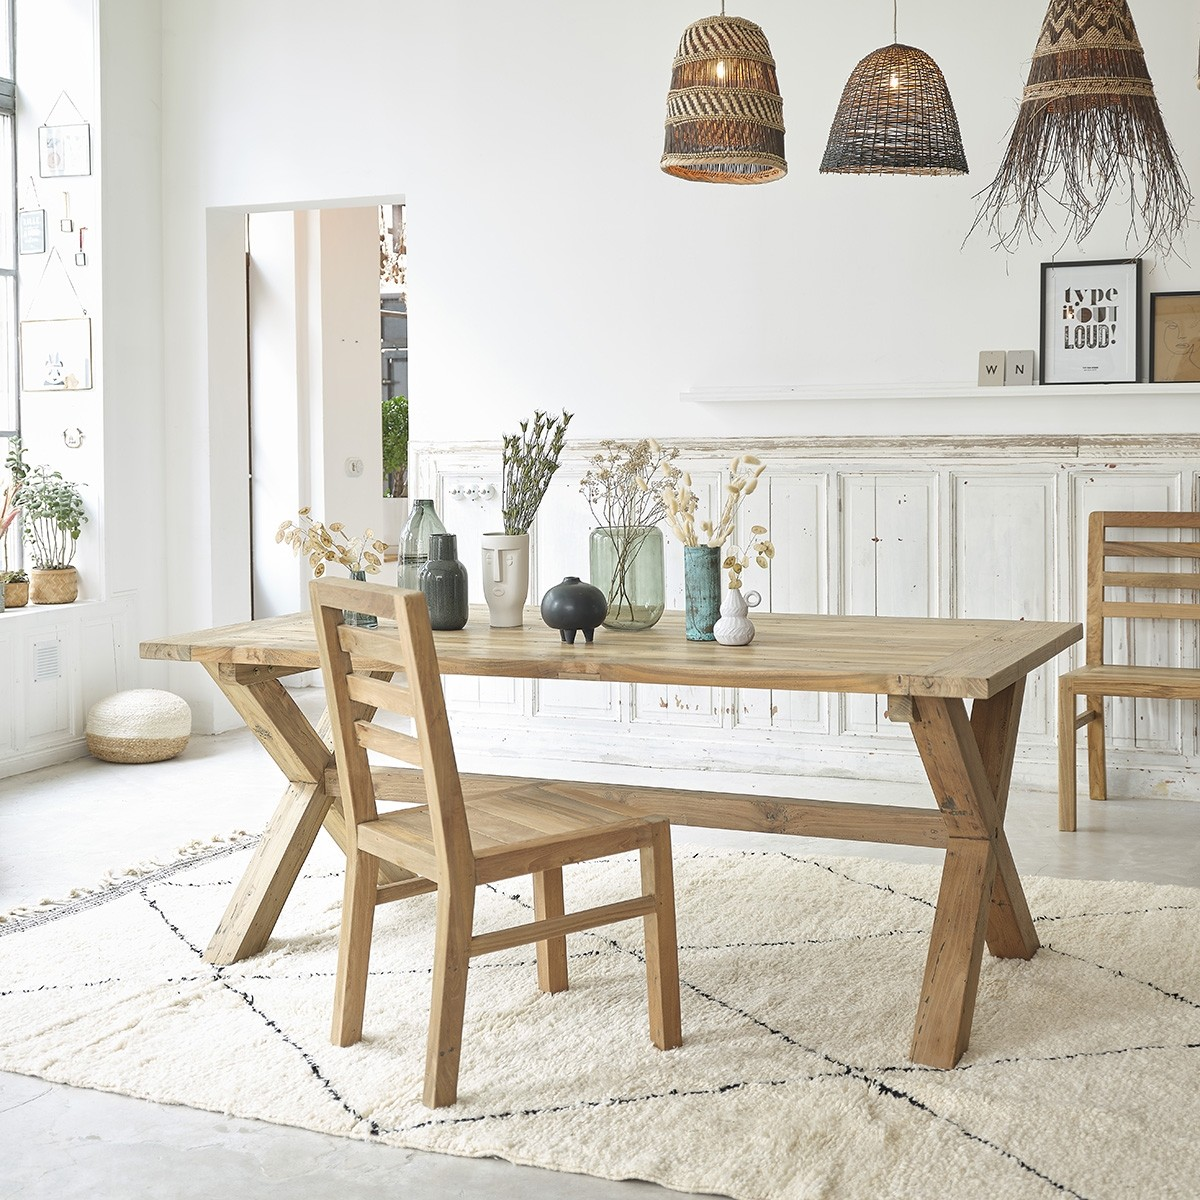 table en bois de teck recycle 8 personnes cargo